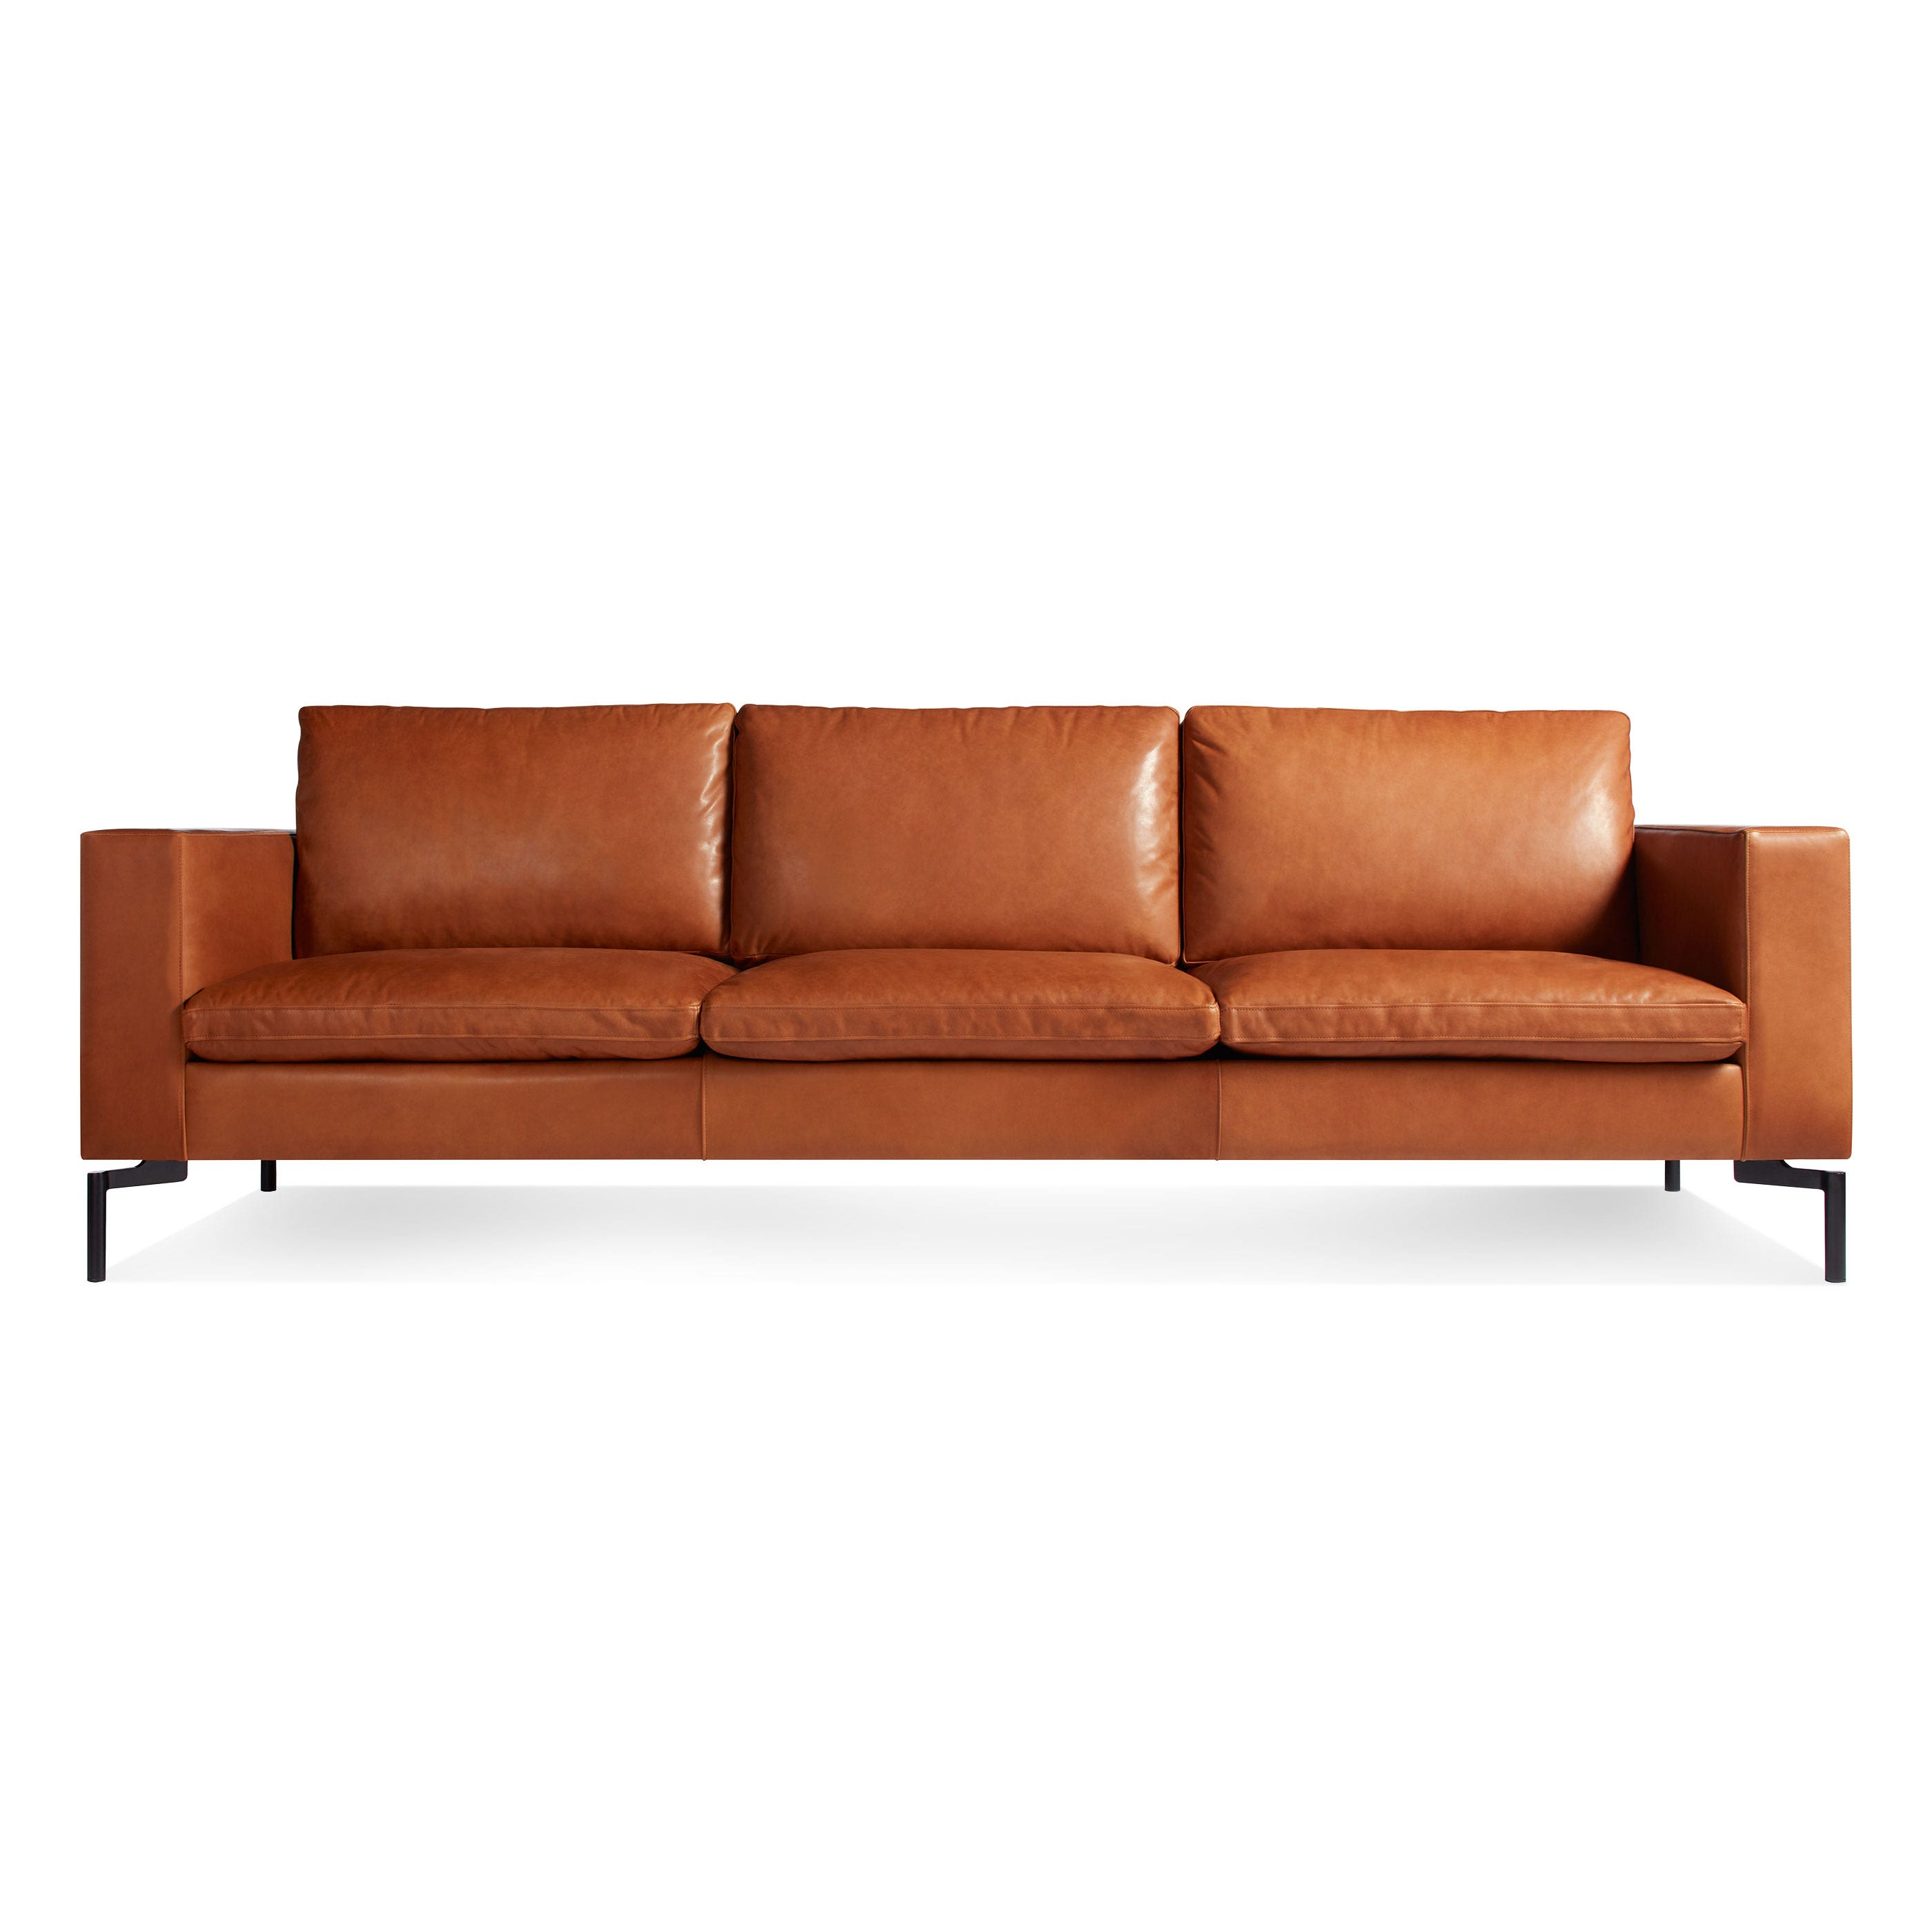 "New Standard 92"" Modern Leather Sofa"